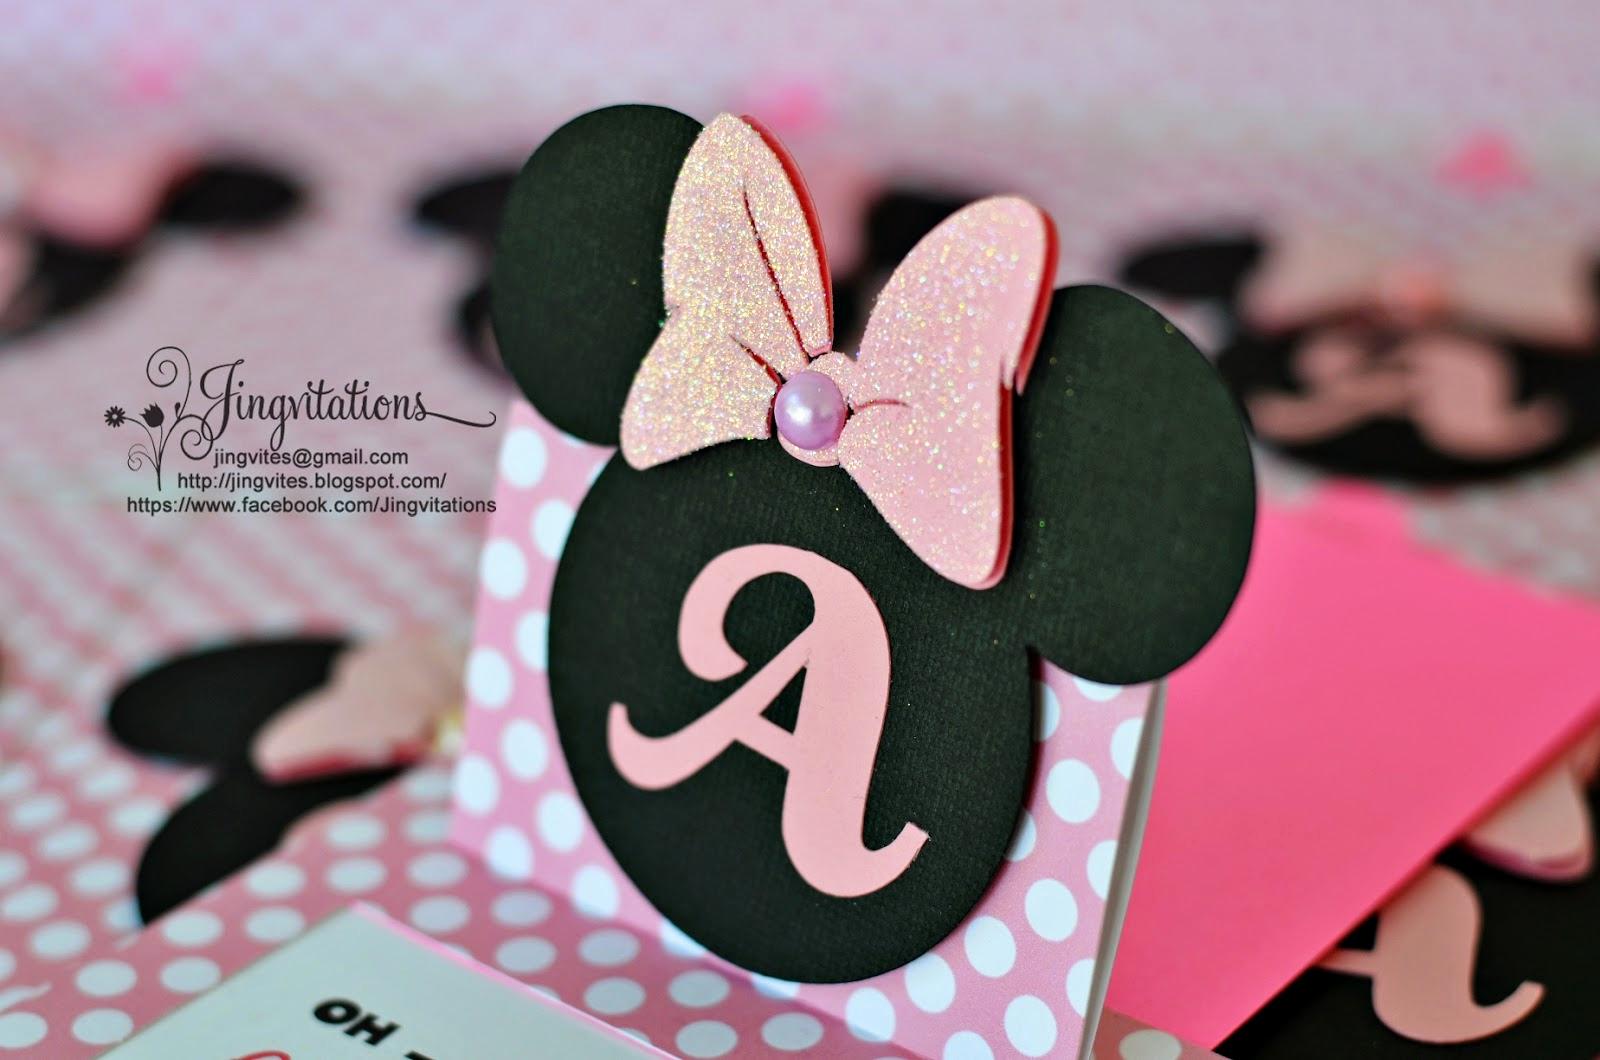 Minnie Mouse Birthday Invitations Beautiful Jingvitations Cricut Handmade Minnie Mouse Pop Up Invitations